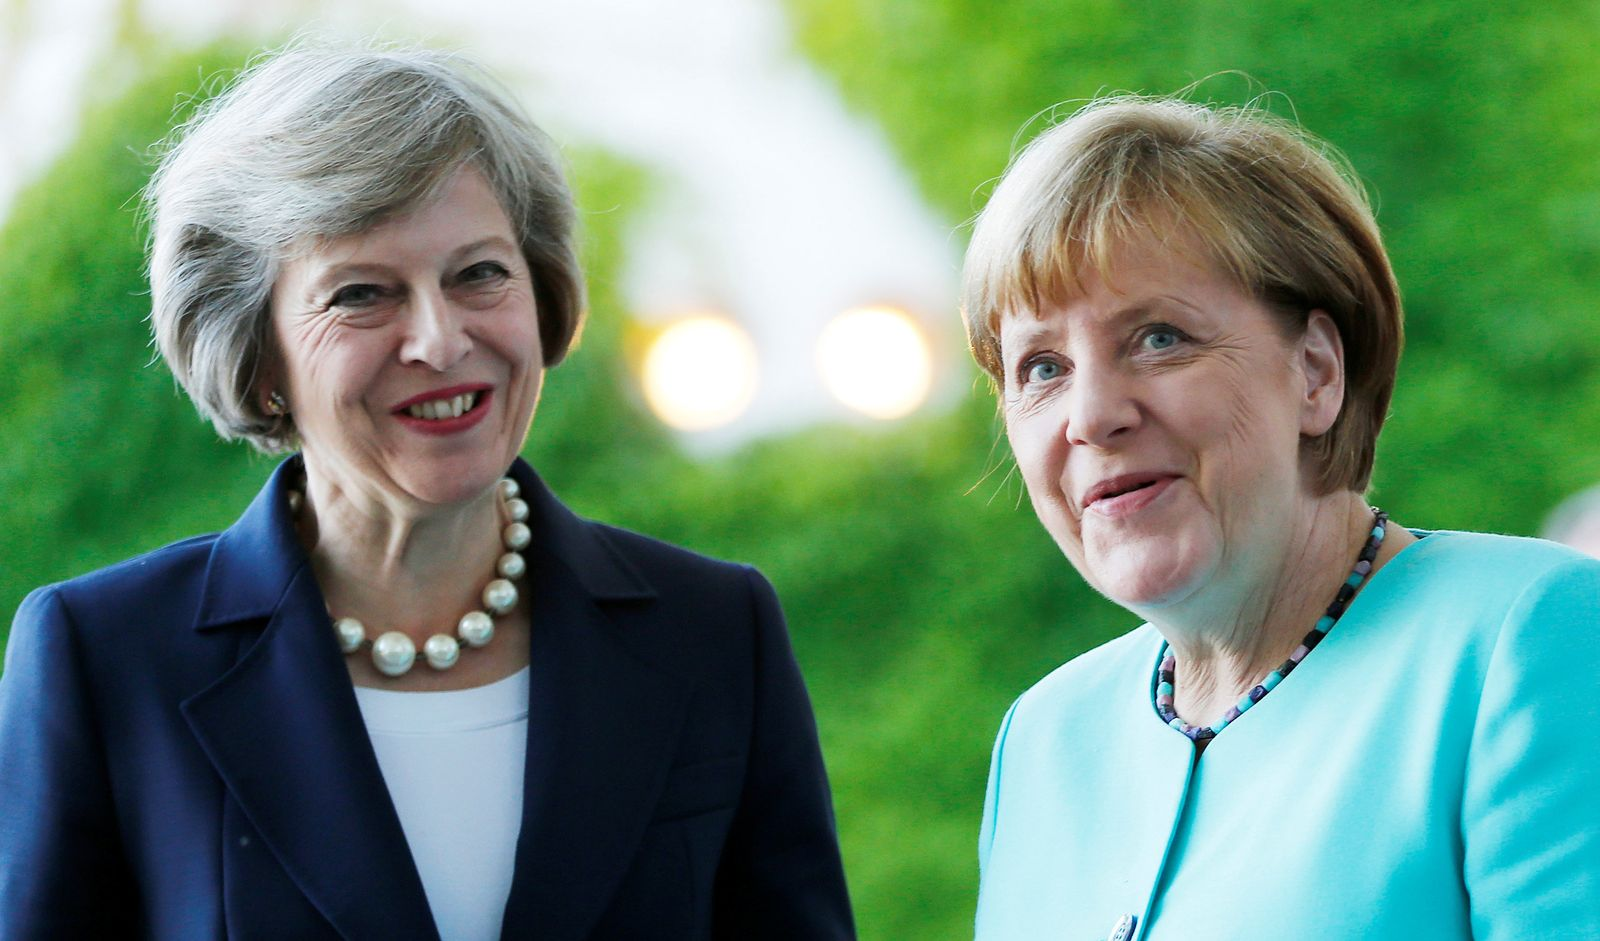 Theresa May / Angela Merkel